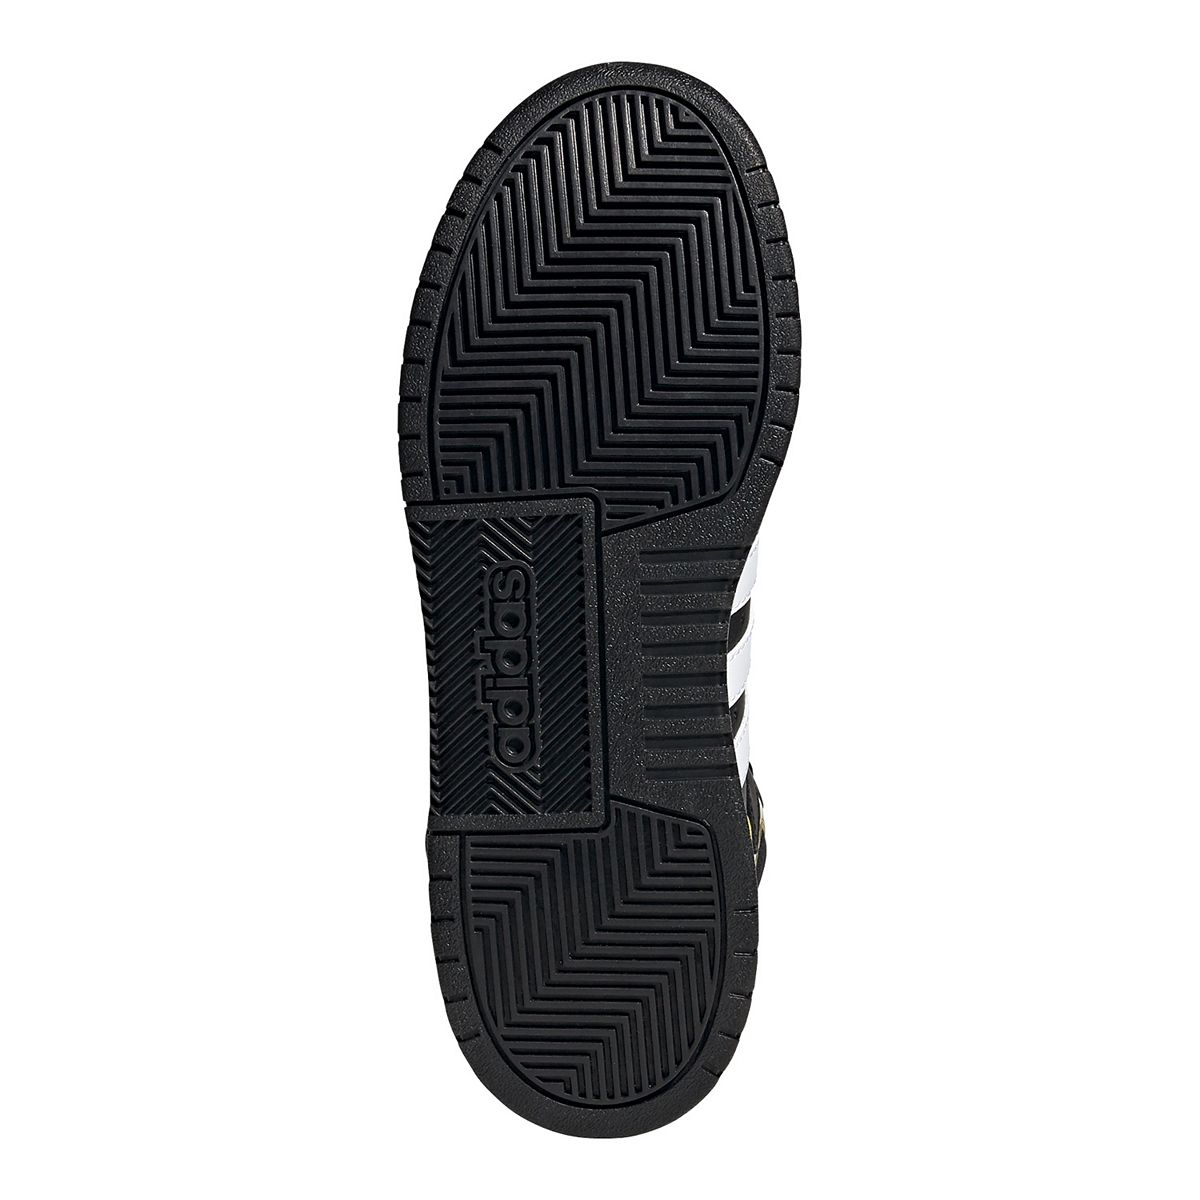 adidas Entrap Cloudfoam Men's Basketball Shoes White Green Gray nKEXX